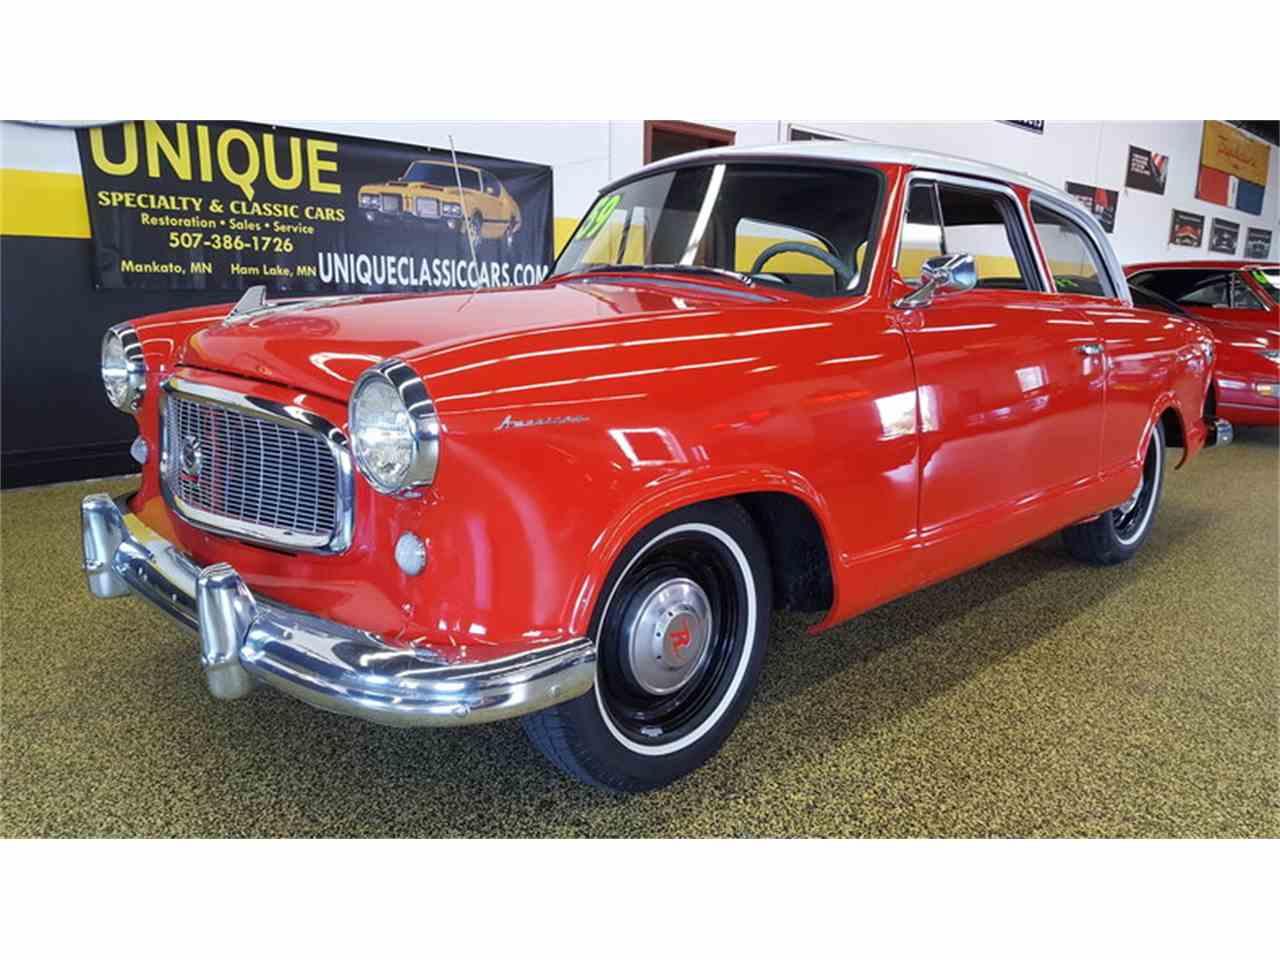 1959 Nash Rambler American for Sale | ClassicCars.com | CC-1067442